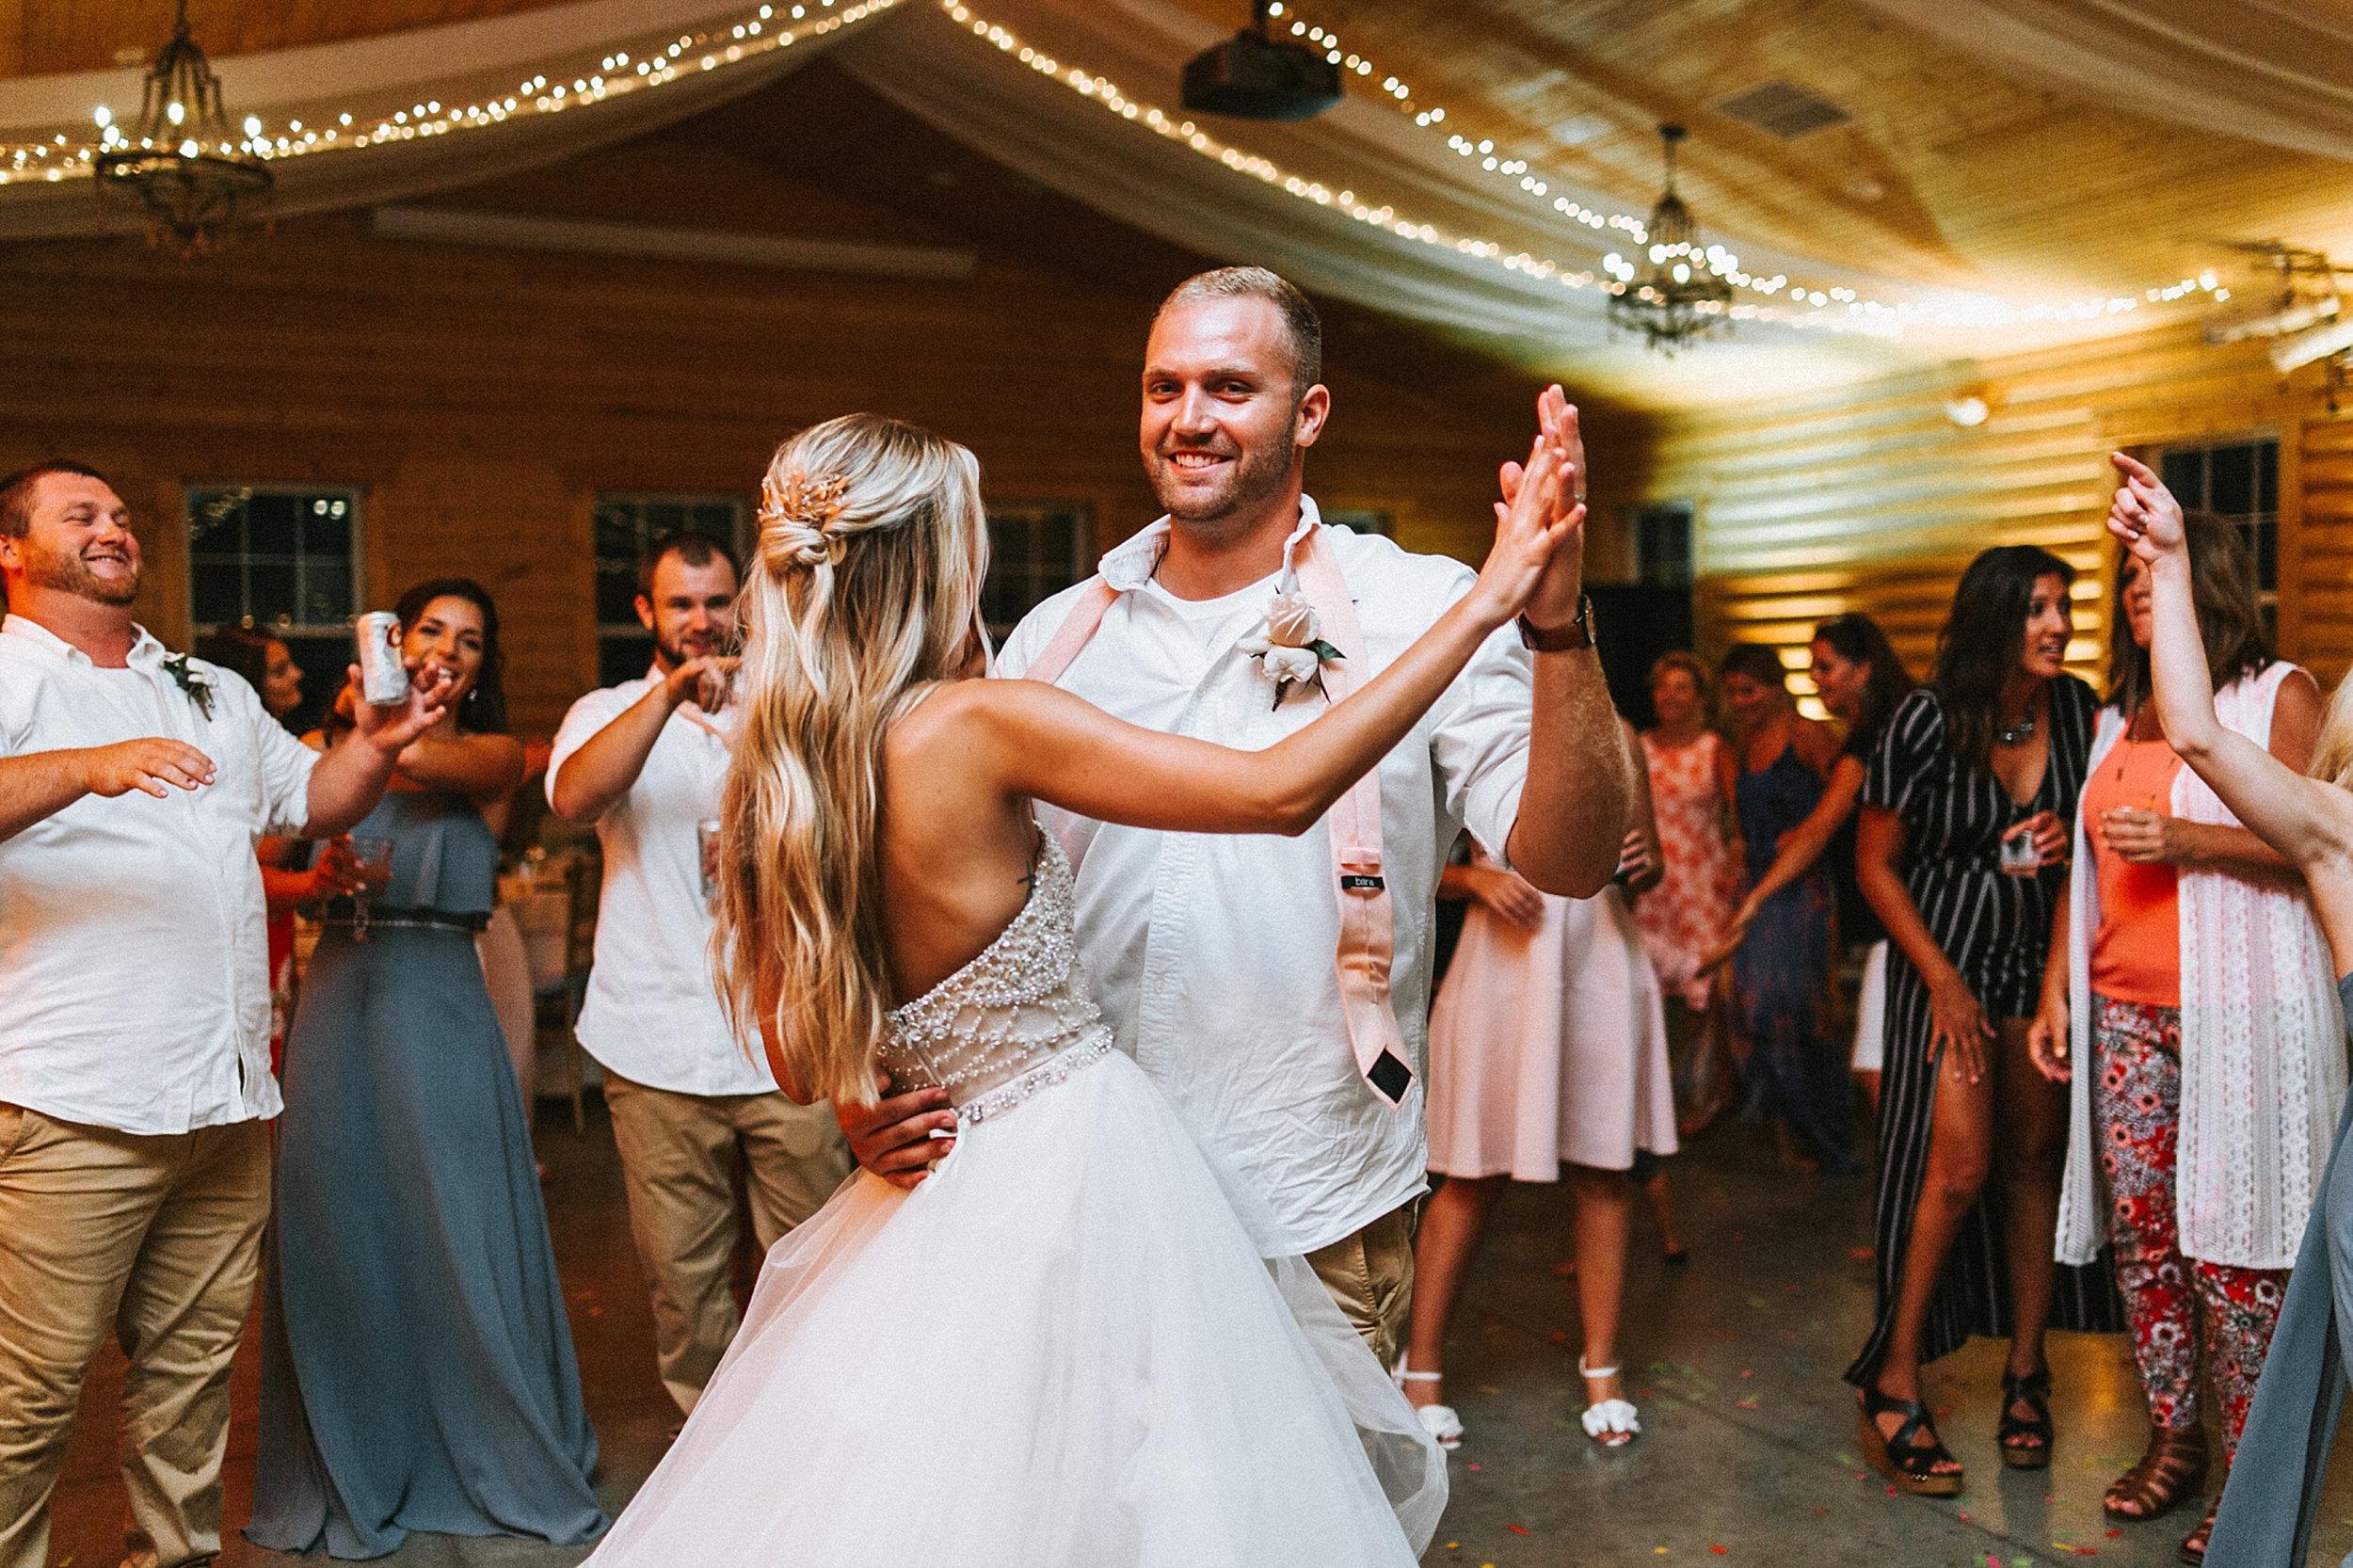 Brooke Townsend Photography - Cincinnati Wedding Photographer (152 of 153).jpg